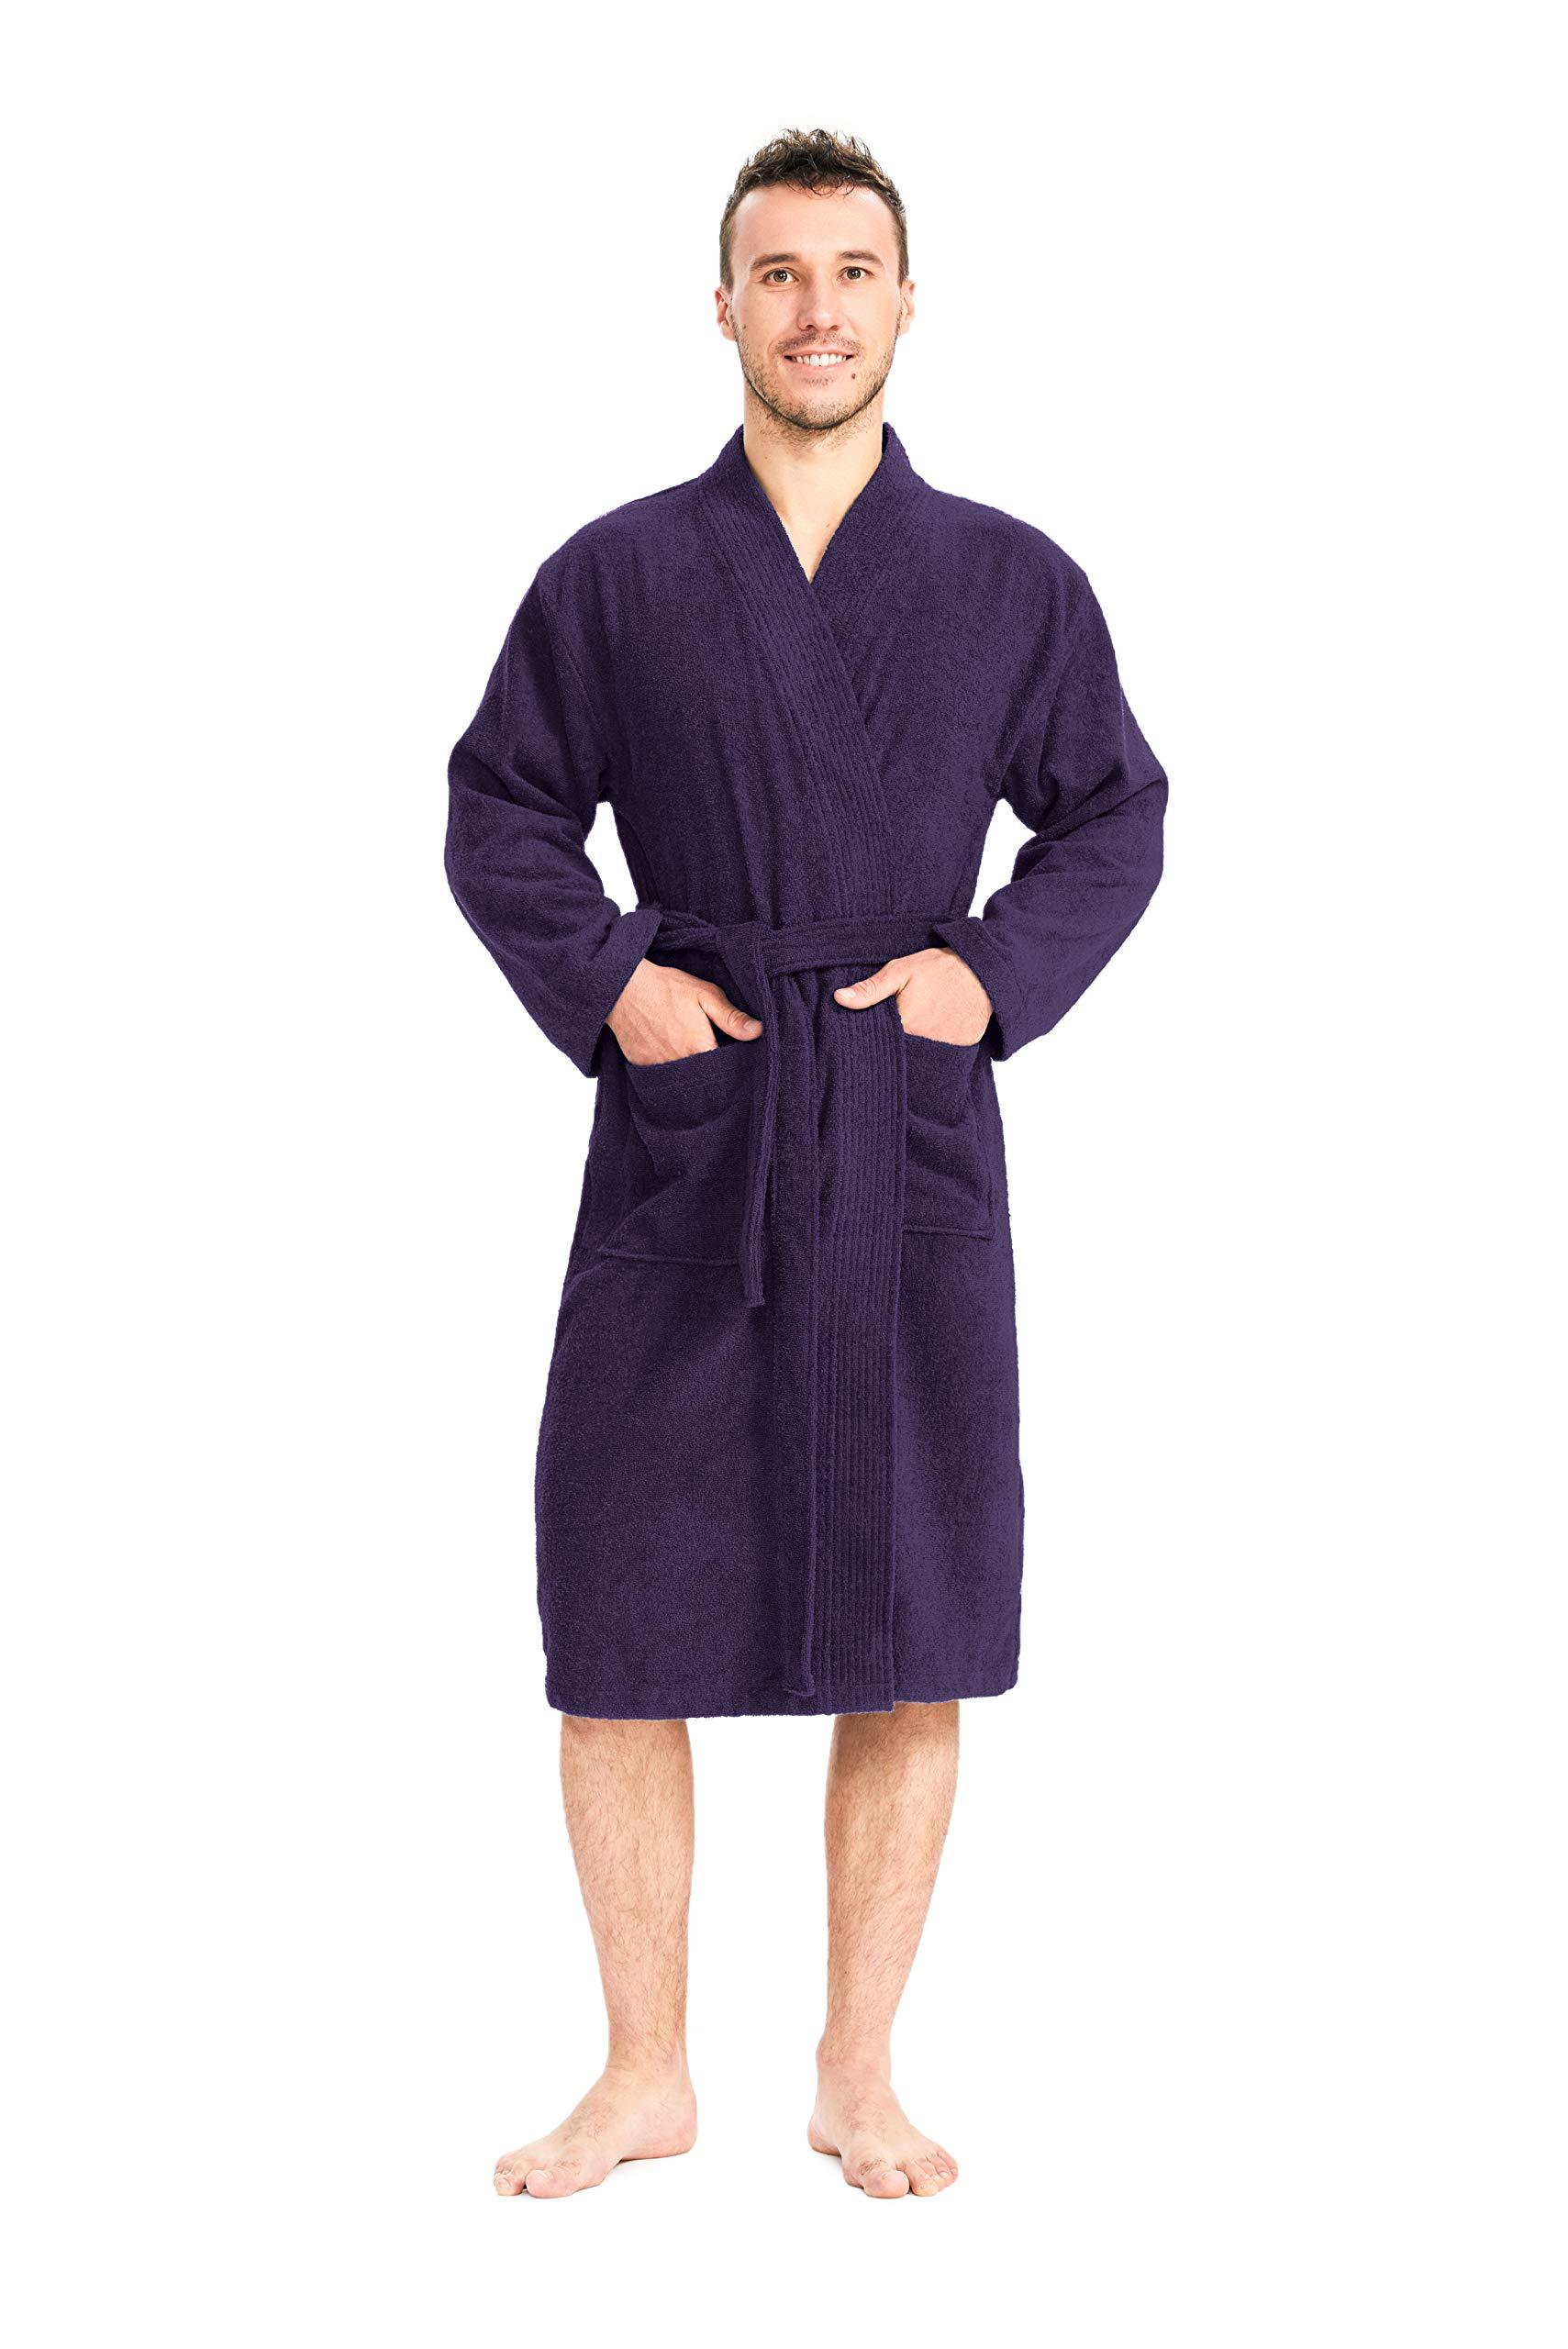 SIORO Men's Bathorbe Long Soft Robe Lightweight Sleepwear Absorbent Loungwear Pajamas Gown Gothic Grape L